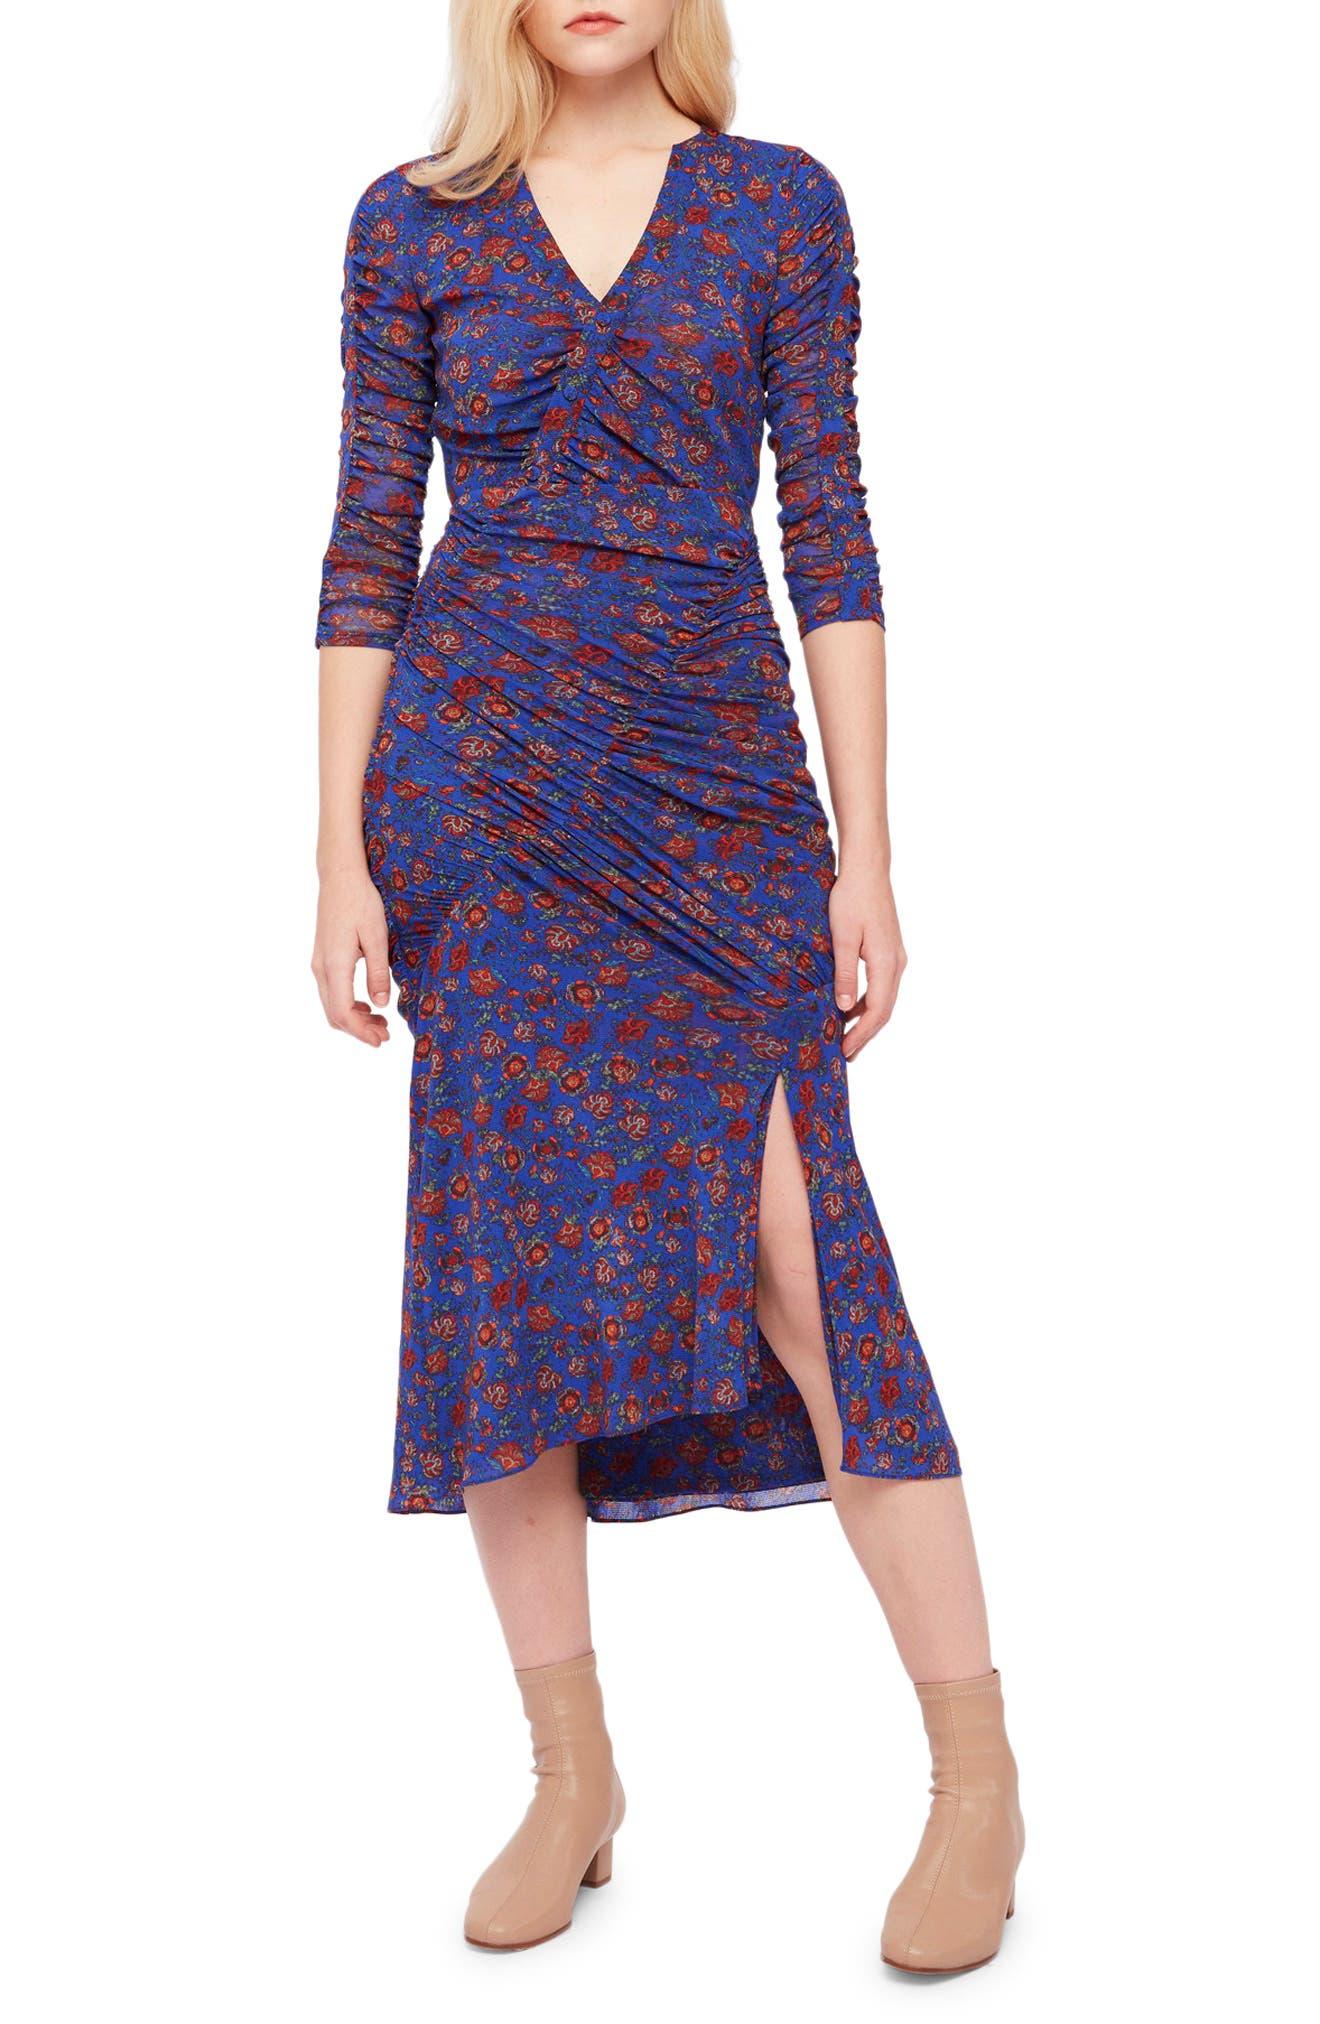 Breilla Floral Dress